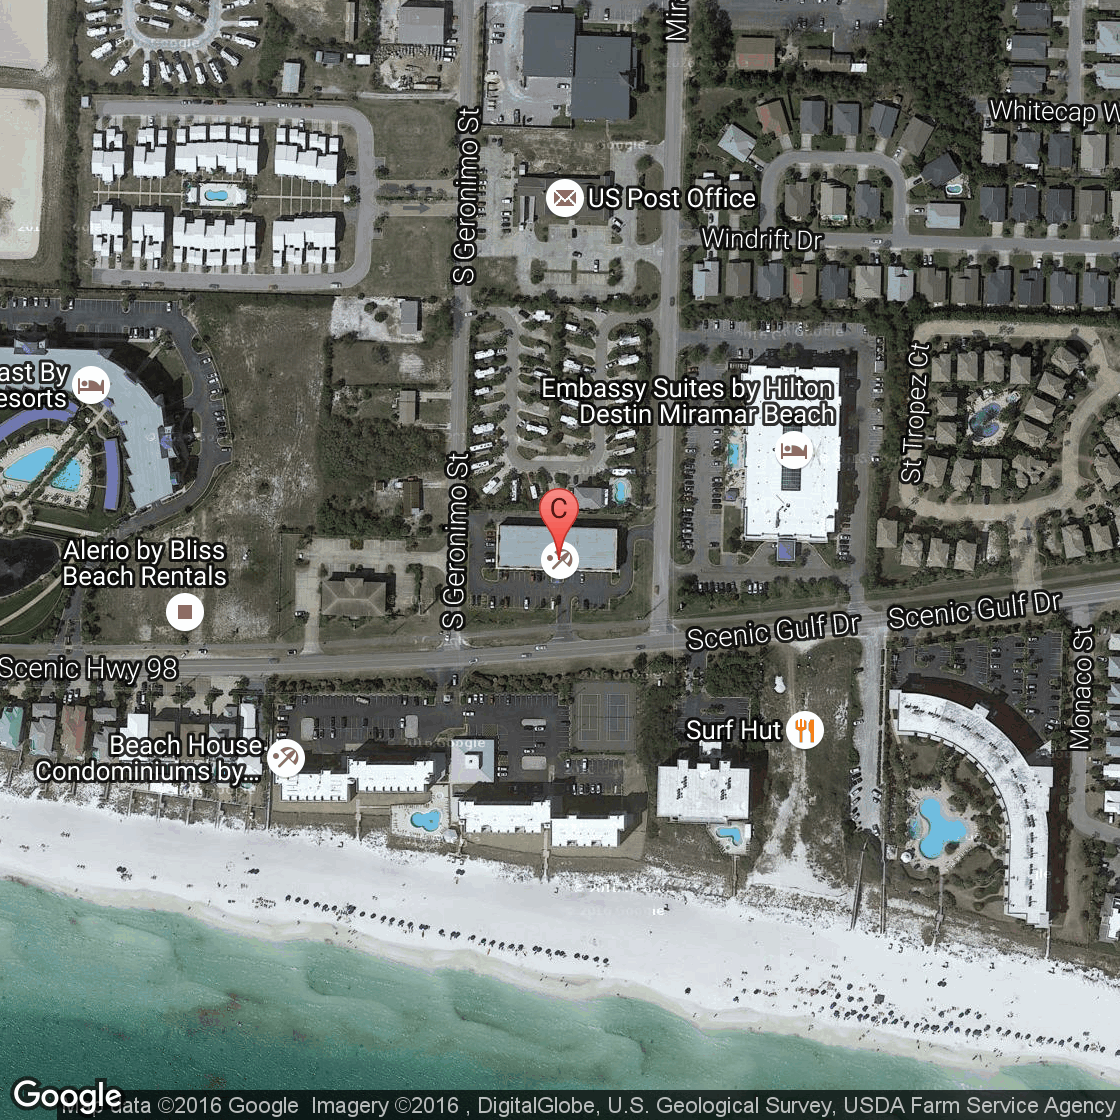 Camping Near Seaside Florida Usa Today